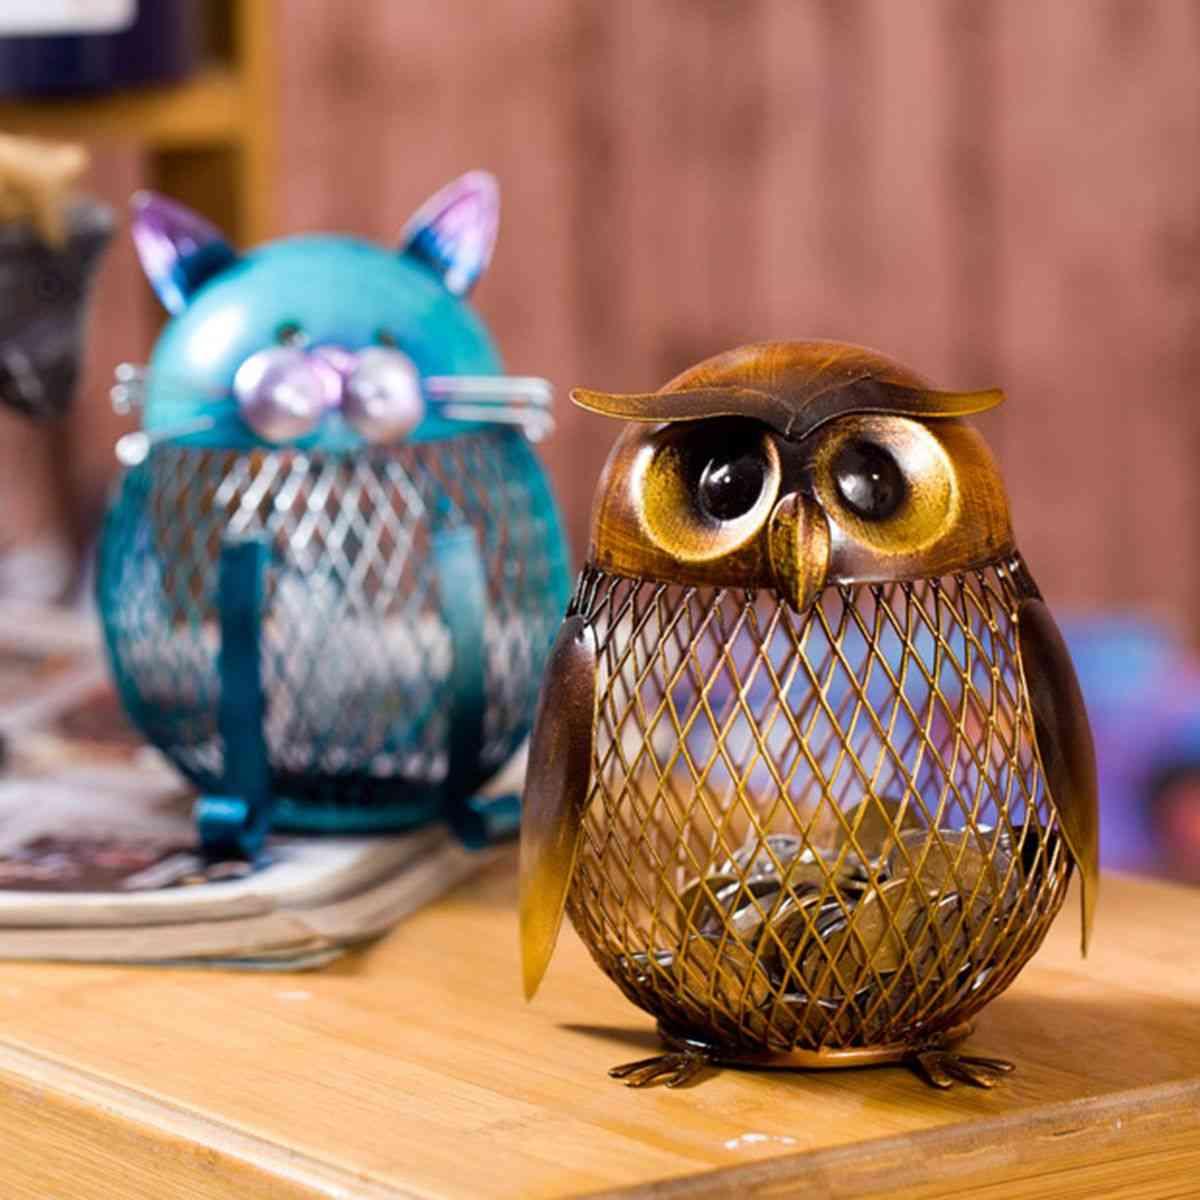 Cute Metal Animal Bird Grid Pot Piggy Bank - Home Decoration Money Boxes